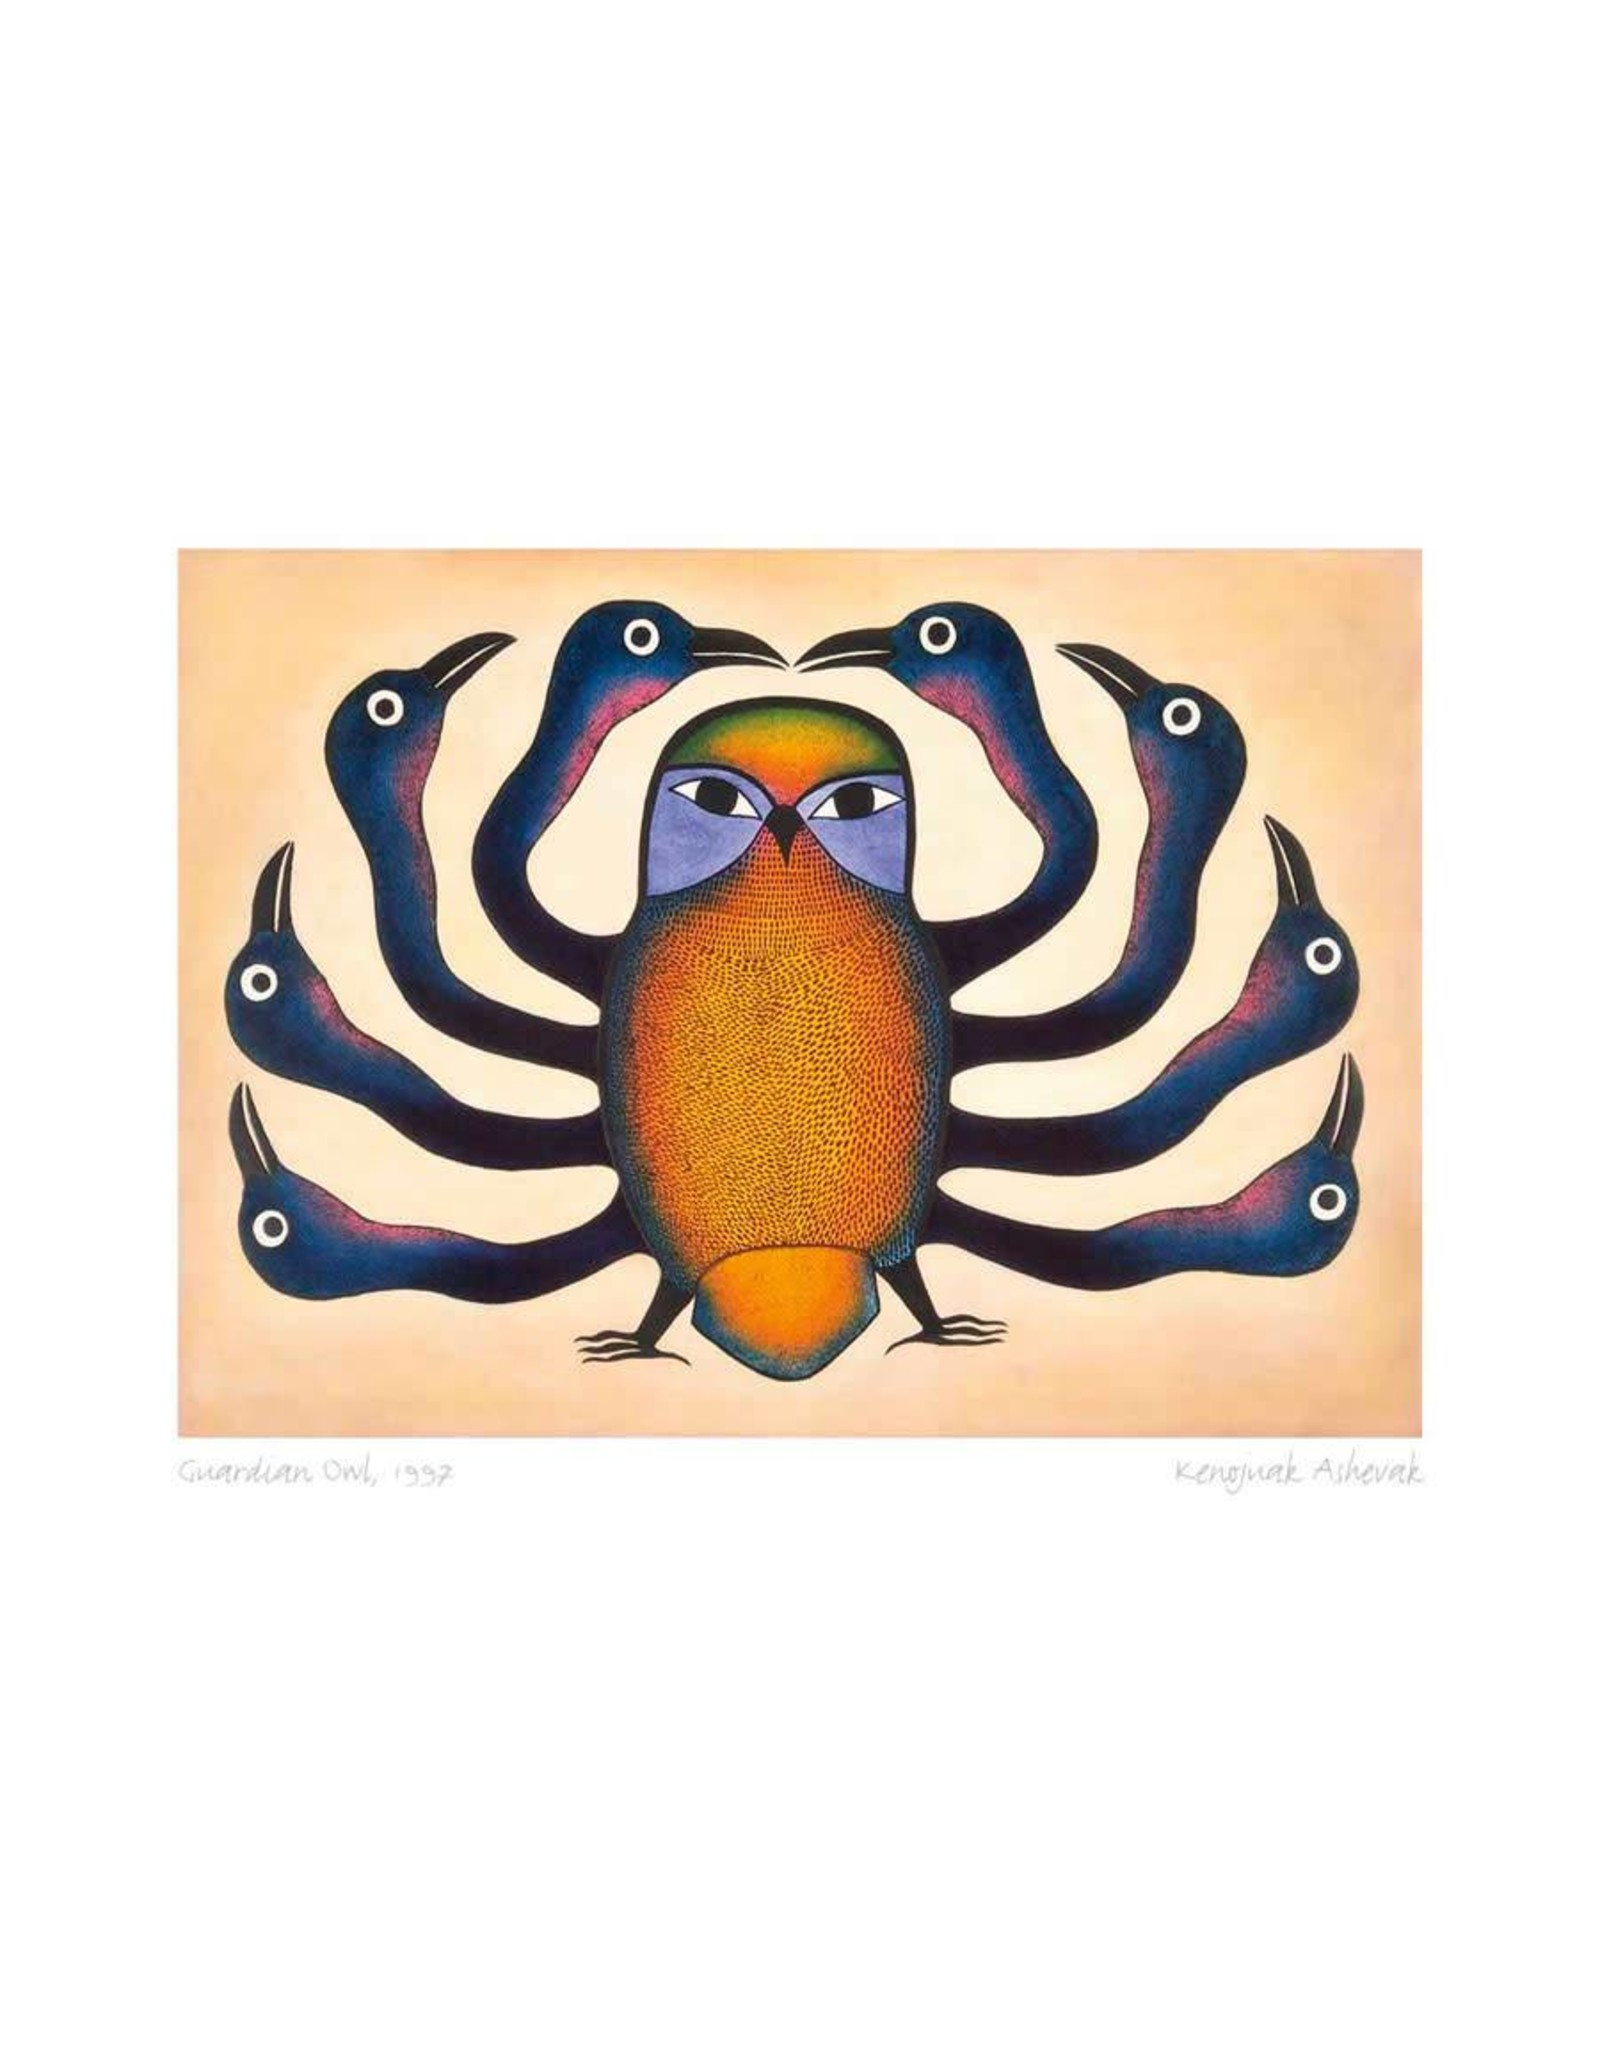 Guardian Owl, 1997 by Kenojuak Ashevak Framed